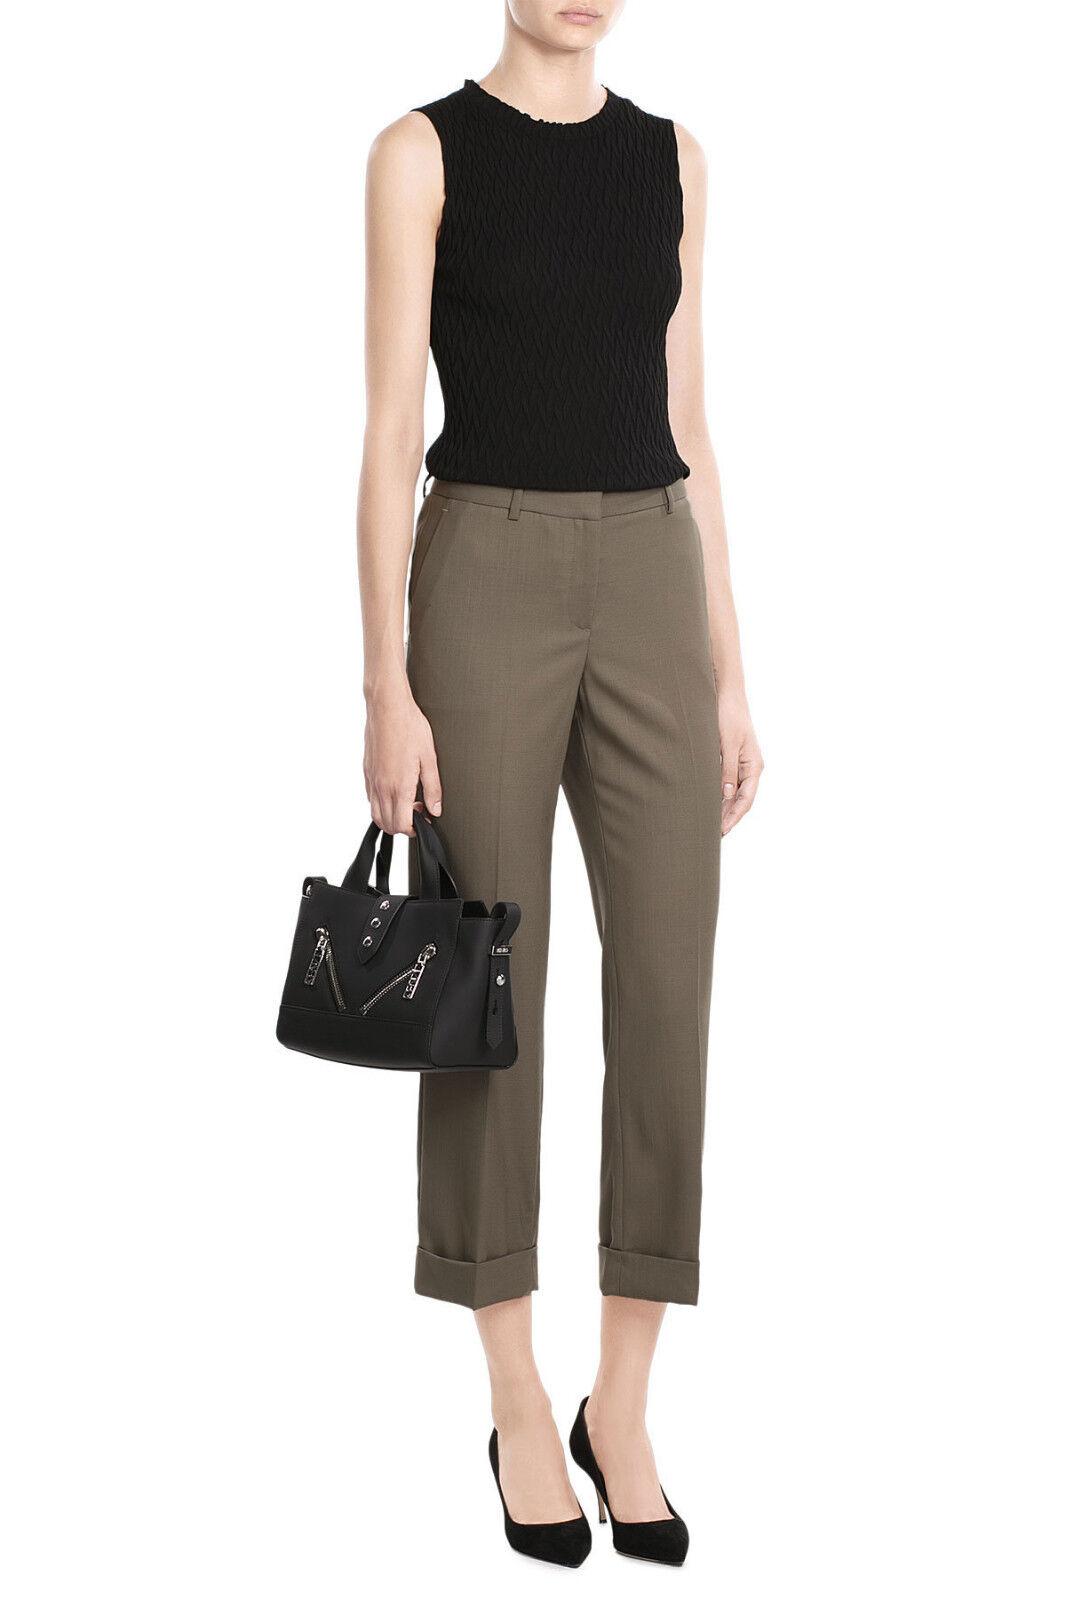 NWT Theory HEZE Military Contour Cropped Wool Cuffed Pants sz 0